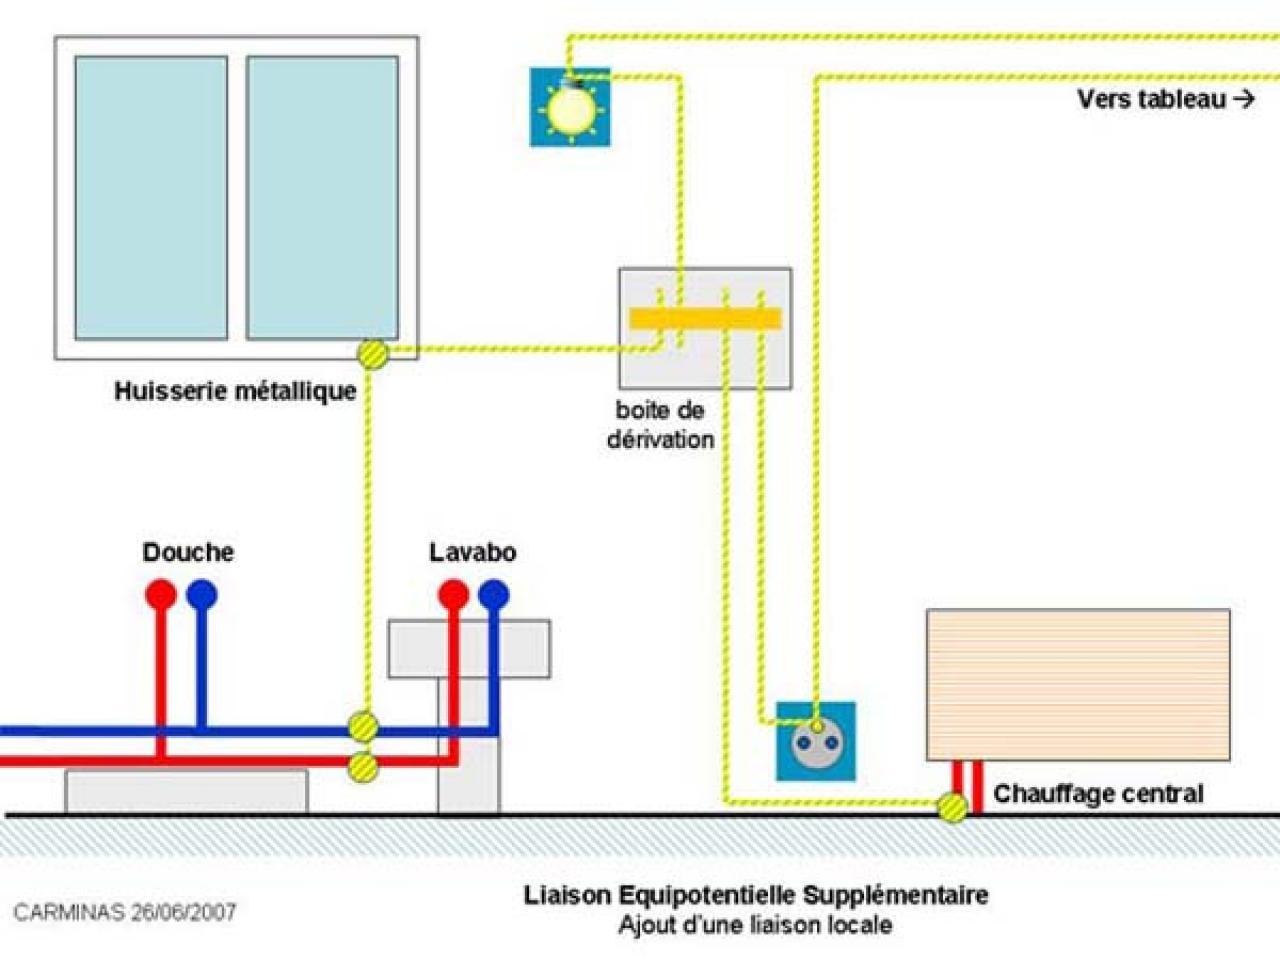 Liason Equipotentielle Salle De Bain ~ liaison quipotentielle principale dans un appartement